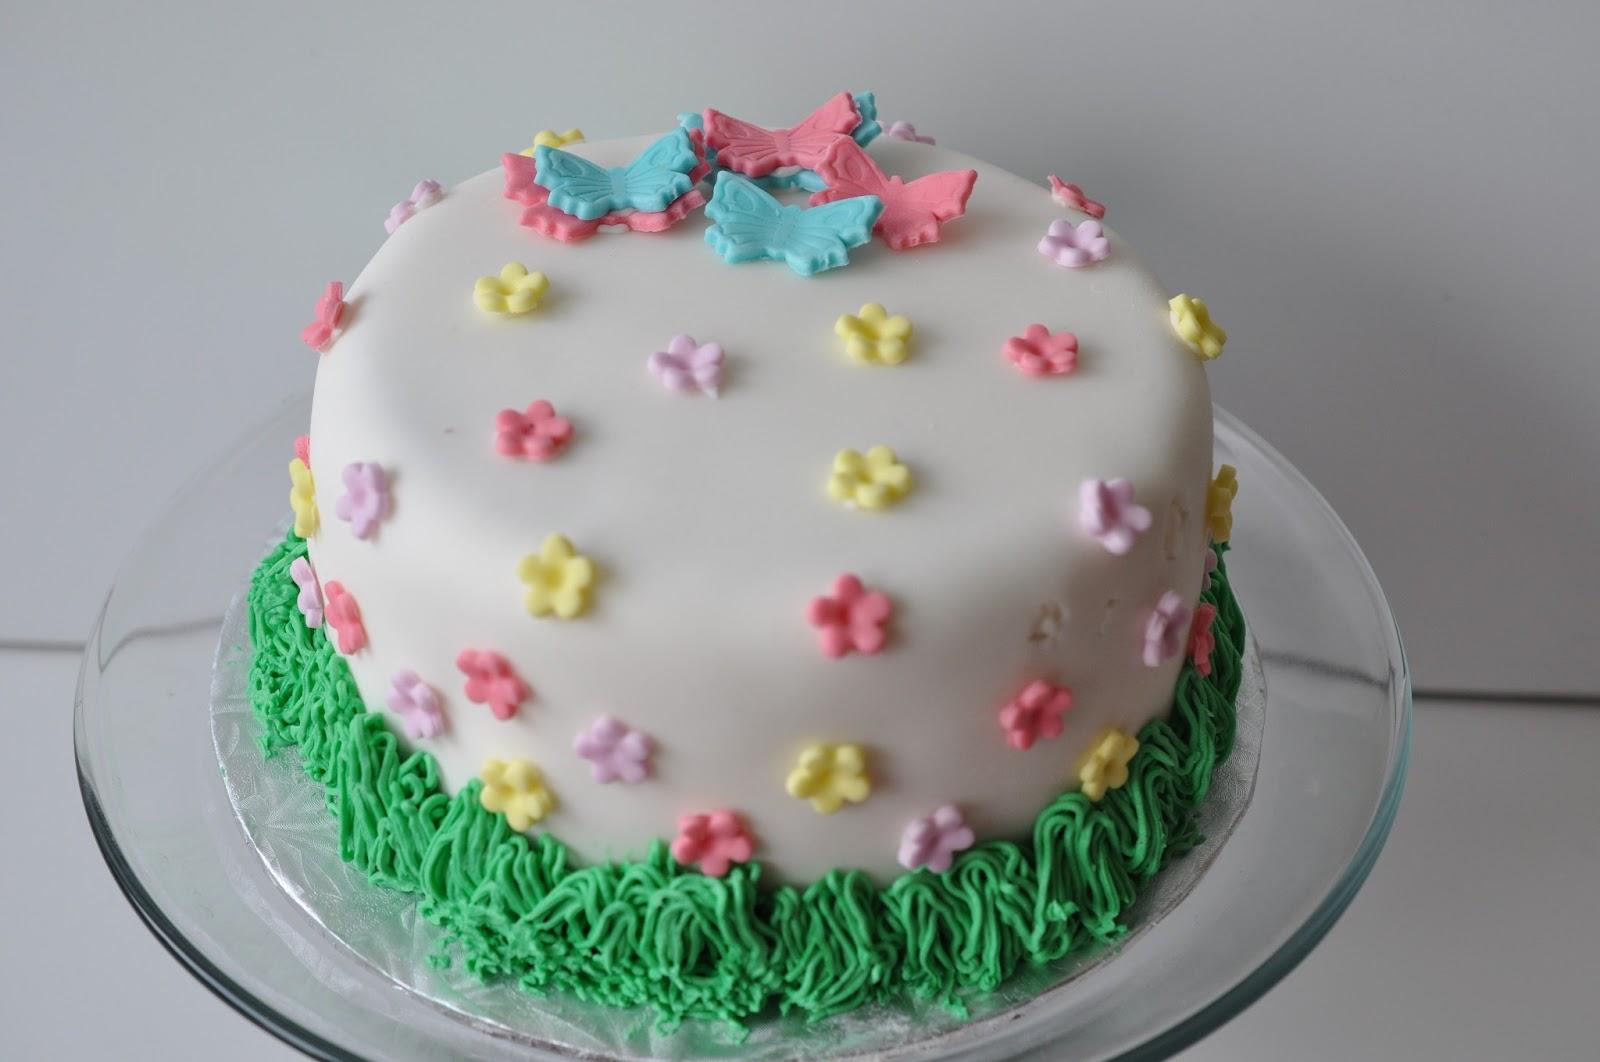 Marvelous 11 Easy Birthday Cakes Spring Photo Spring Cake Ideas Birthday Funny Birthday Cards Online Elaedamsfinfo